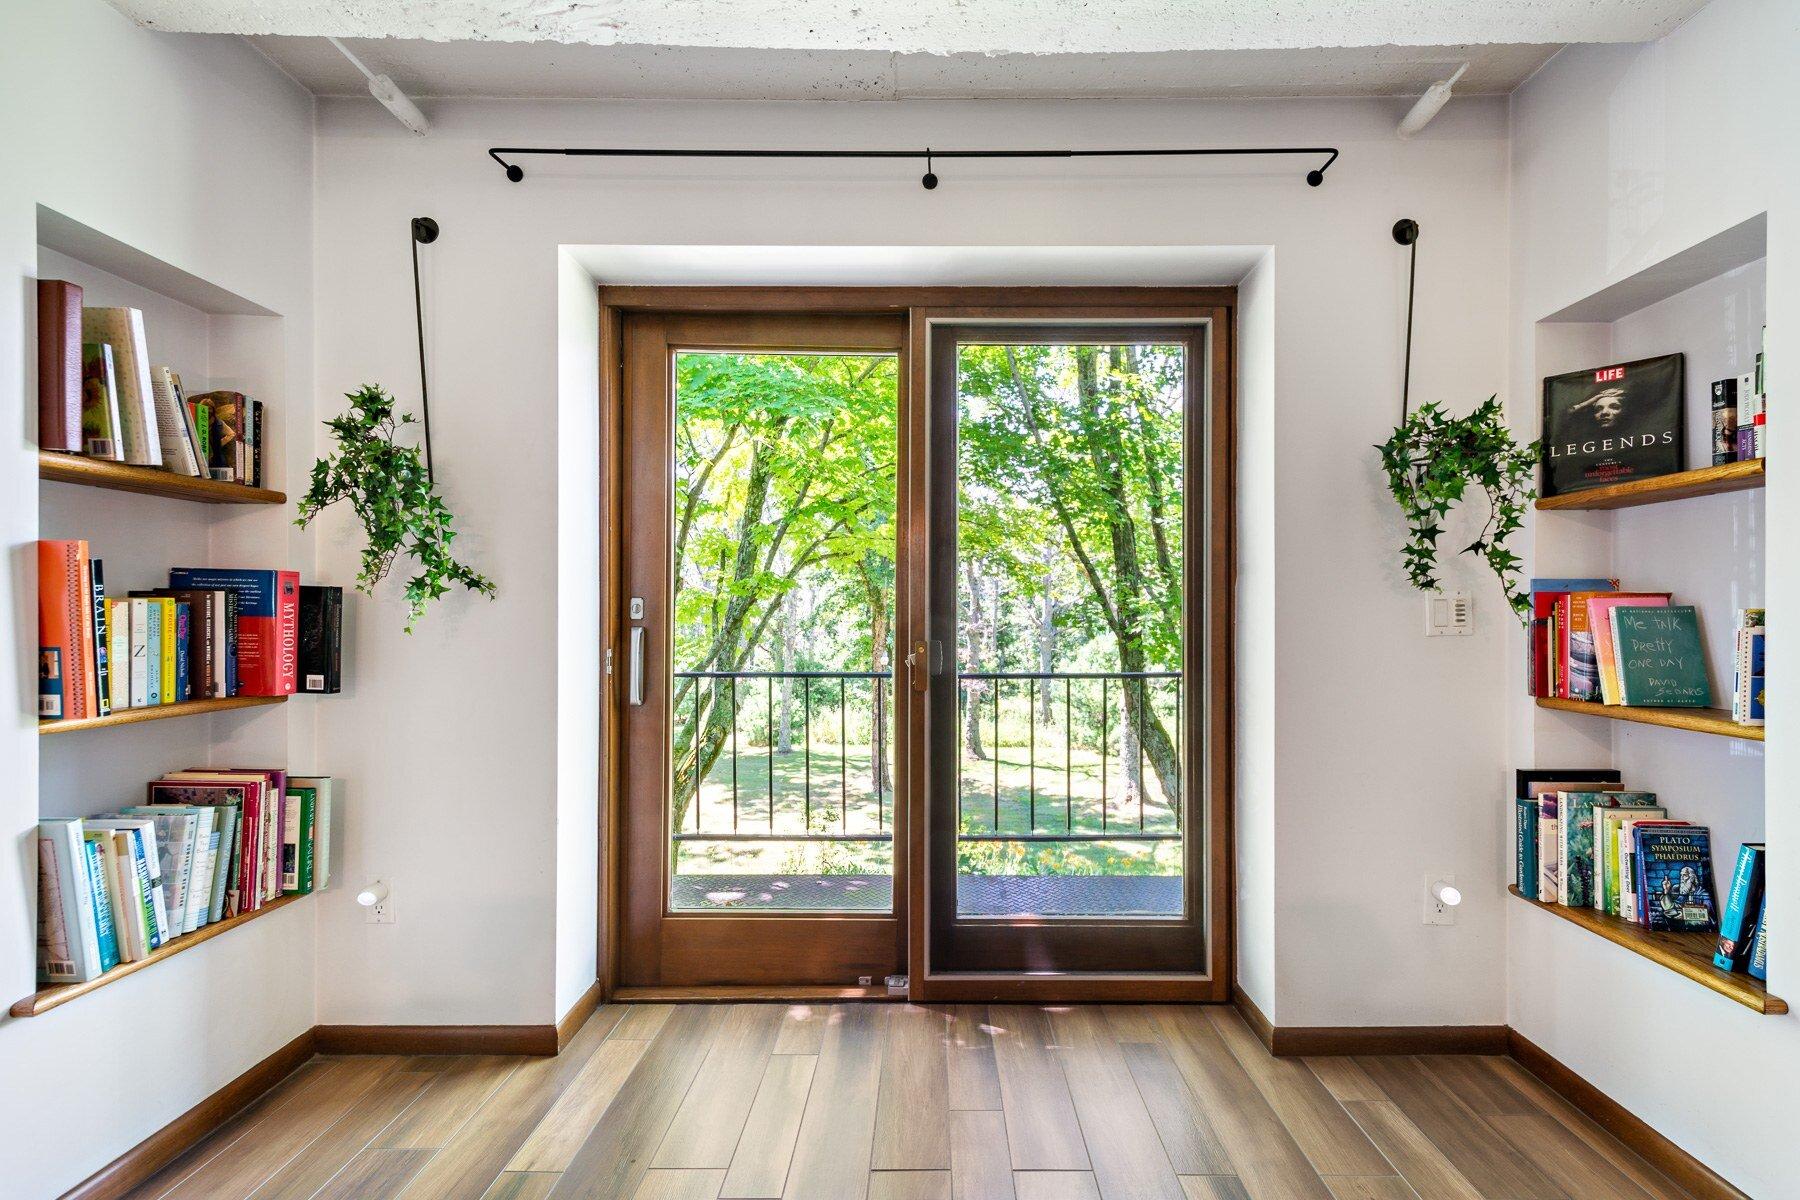 Luxe & Livable_Interior Design Blog Newport Rhode Island_12.jpg